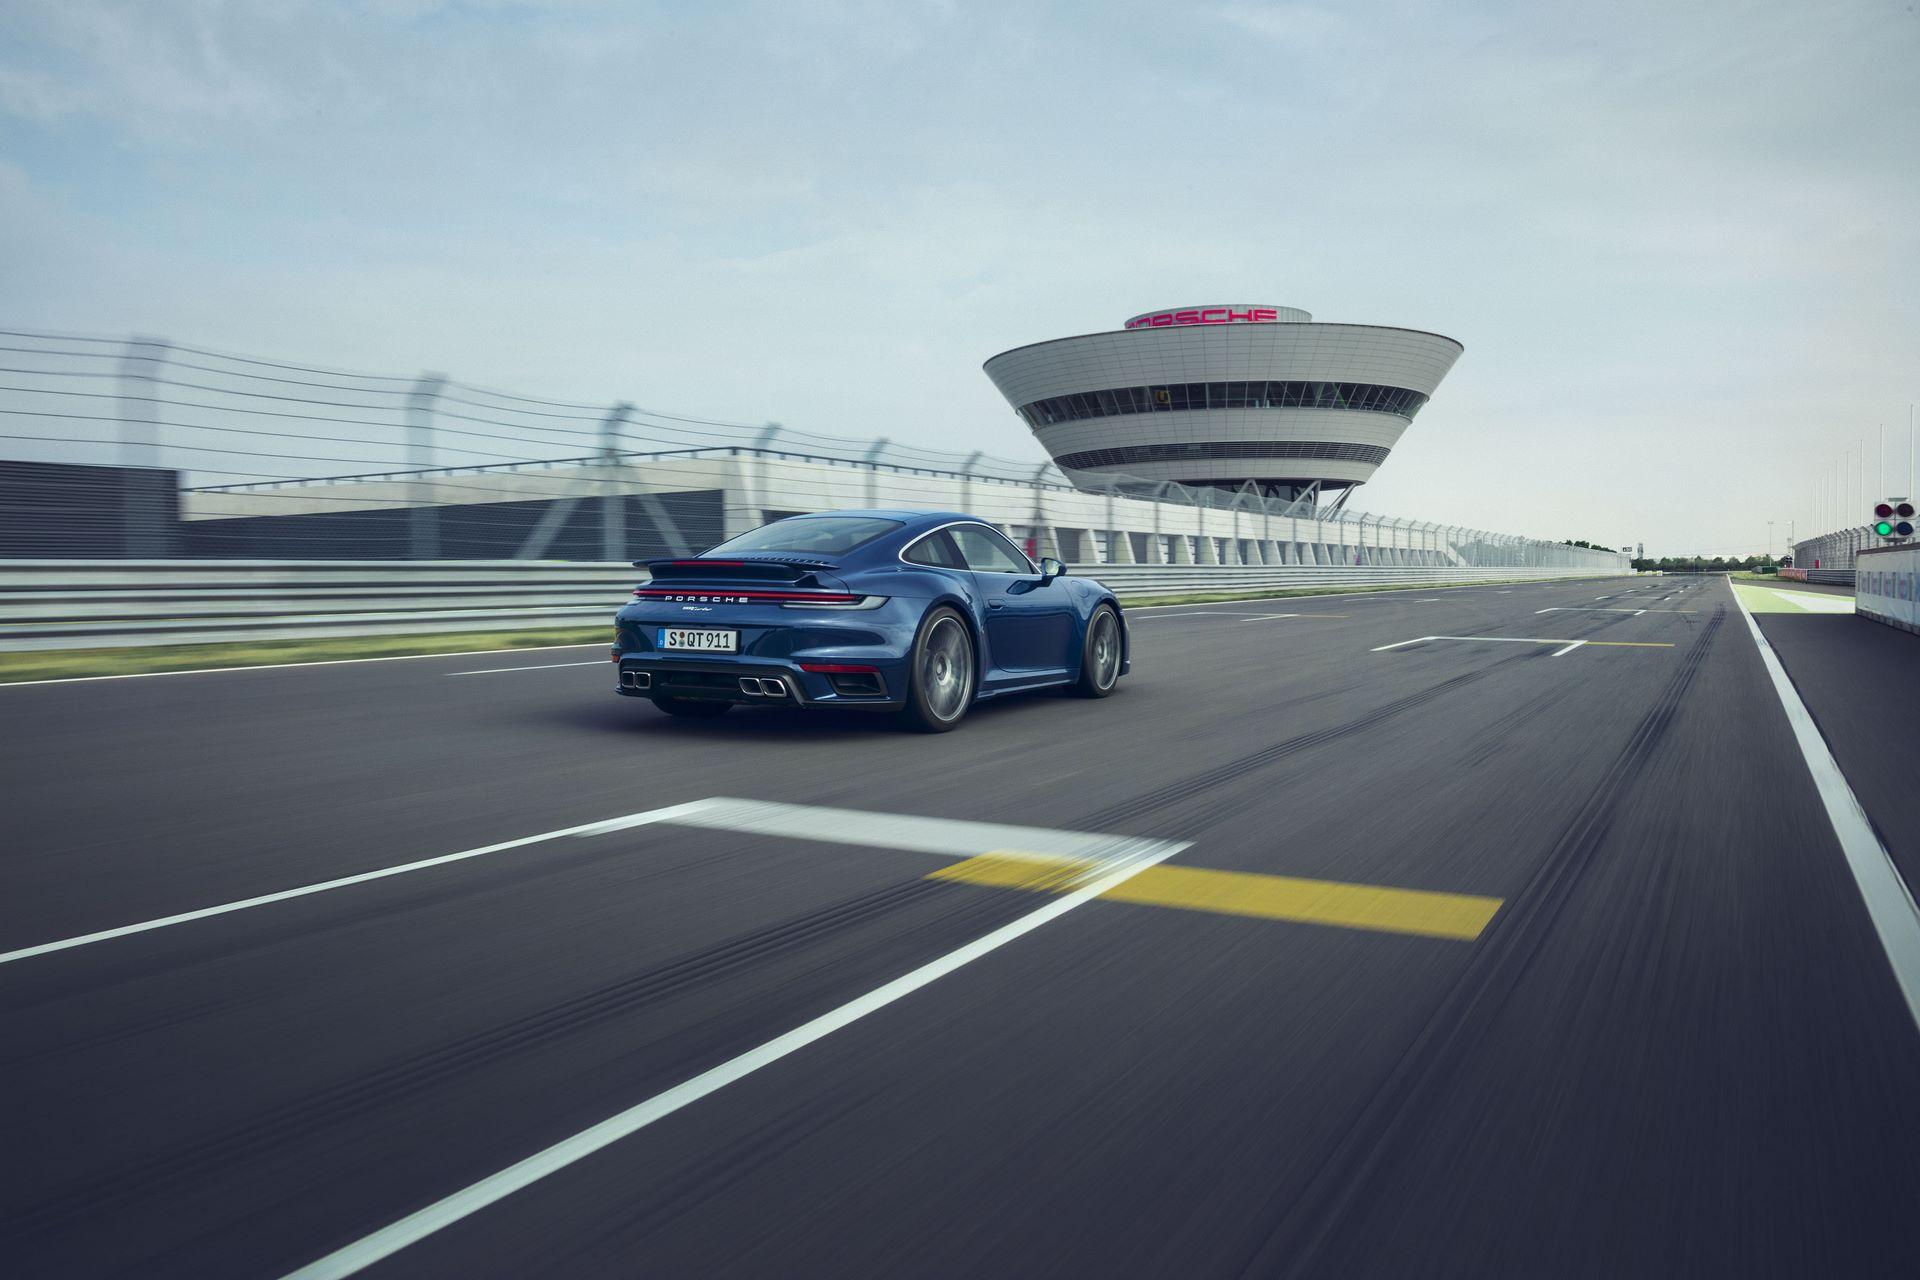 Porsche-911-Turbo-2020-9